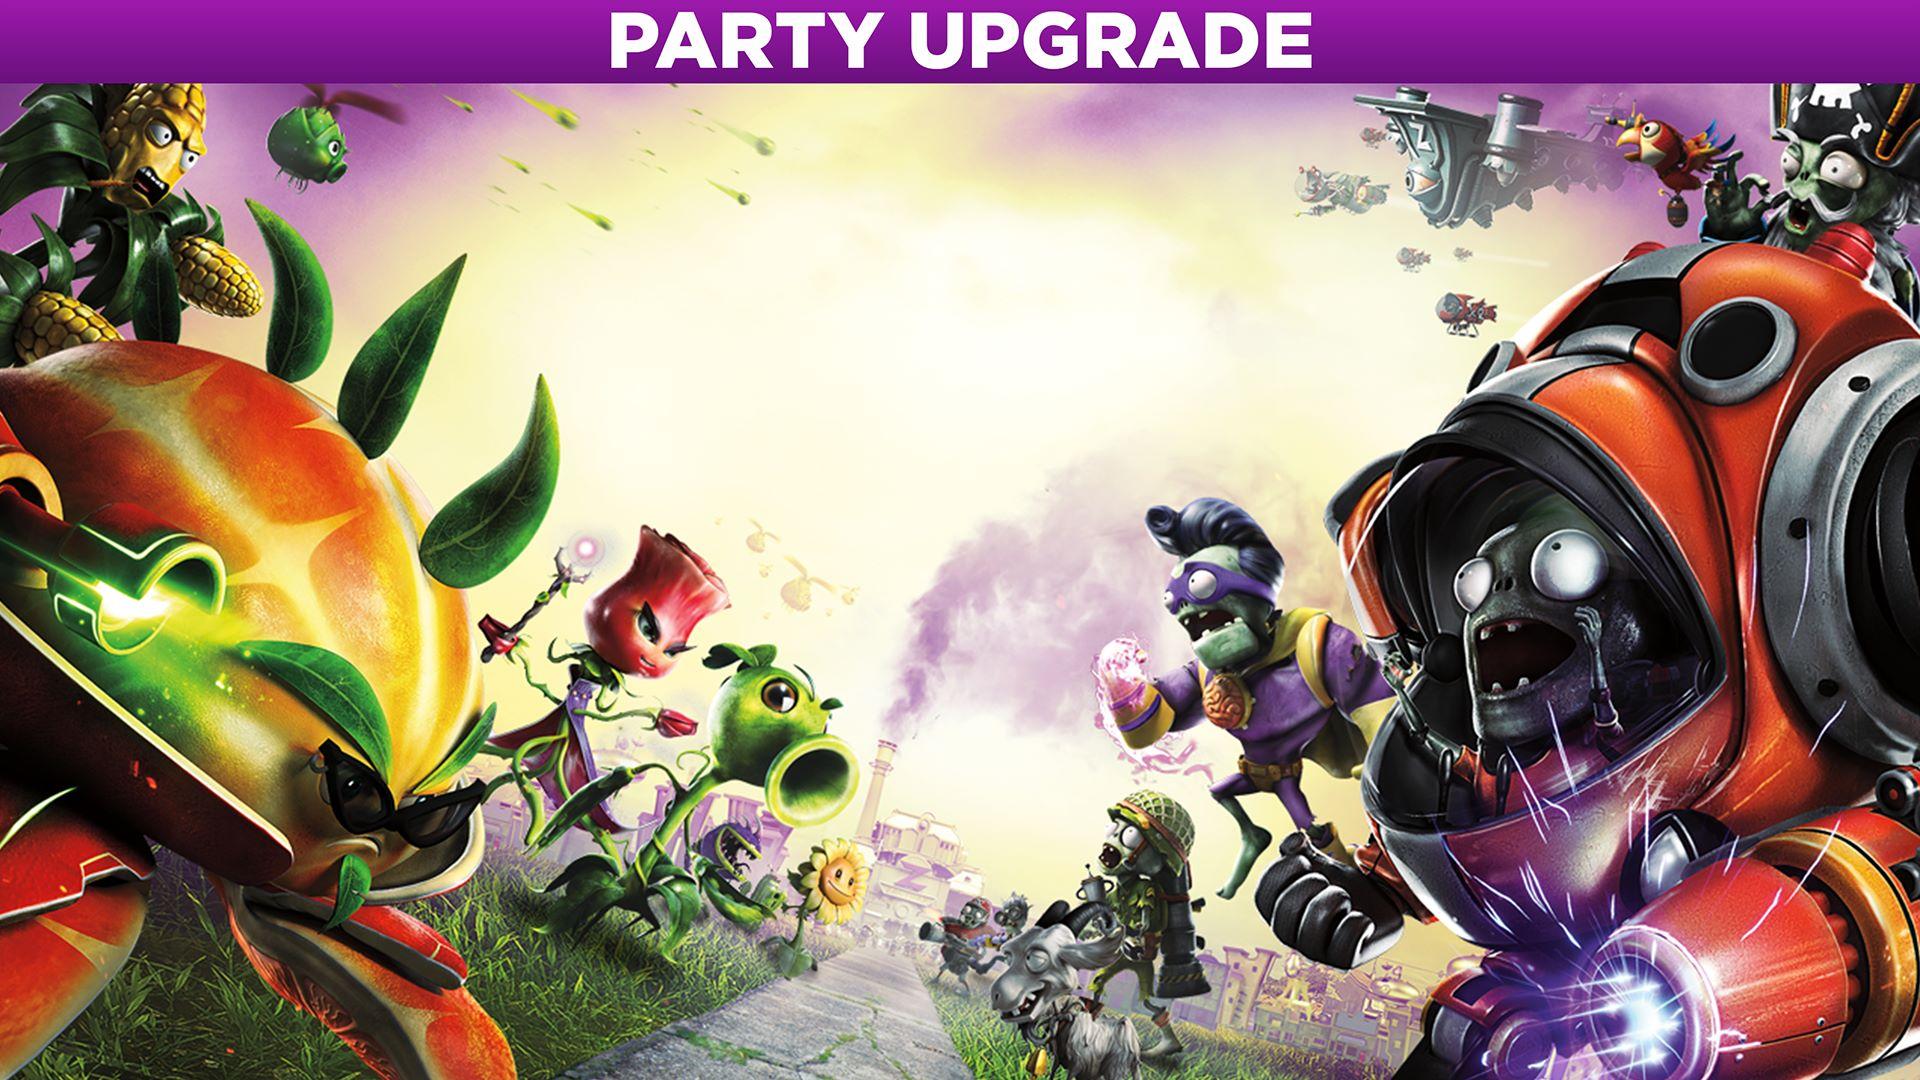 plants vs zombies garden warfare 2 party upgrade - Plants Vs Zombie Garden Warfare